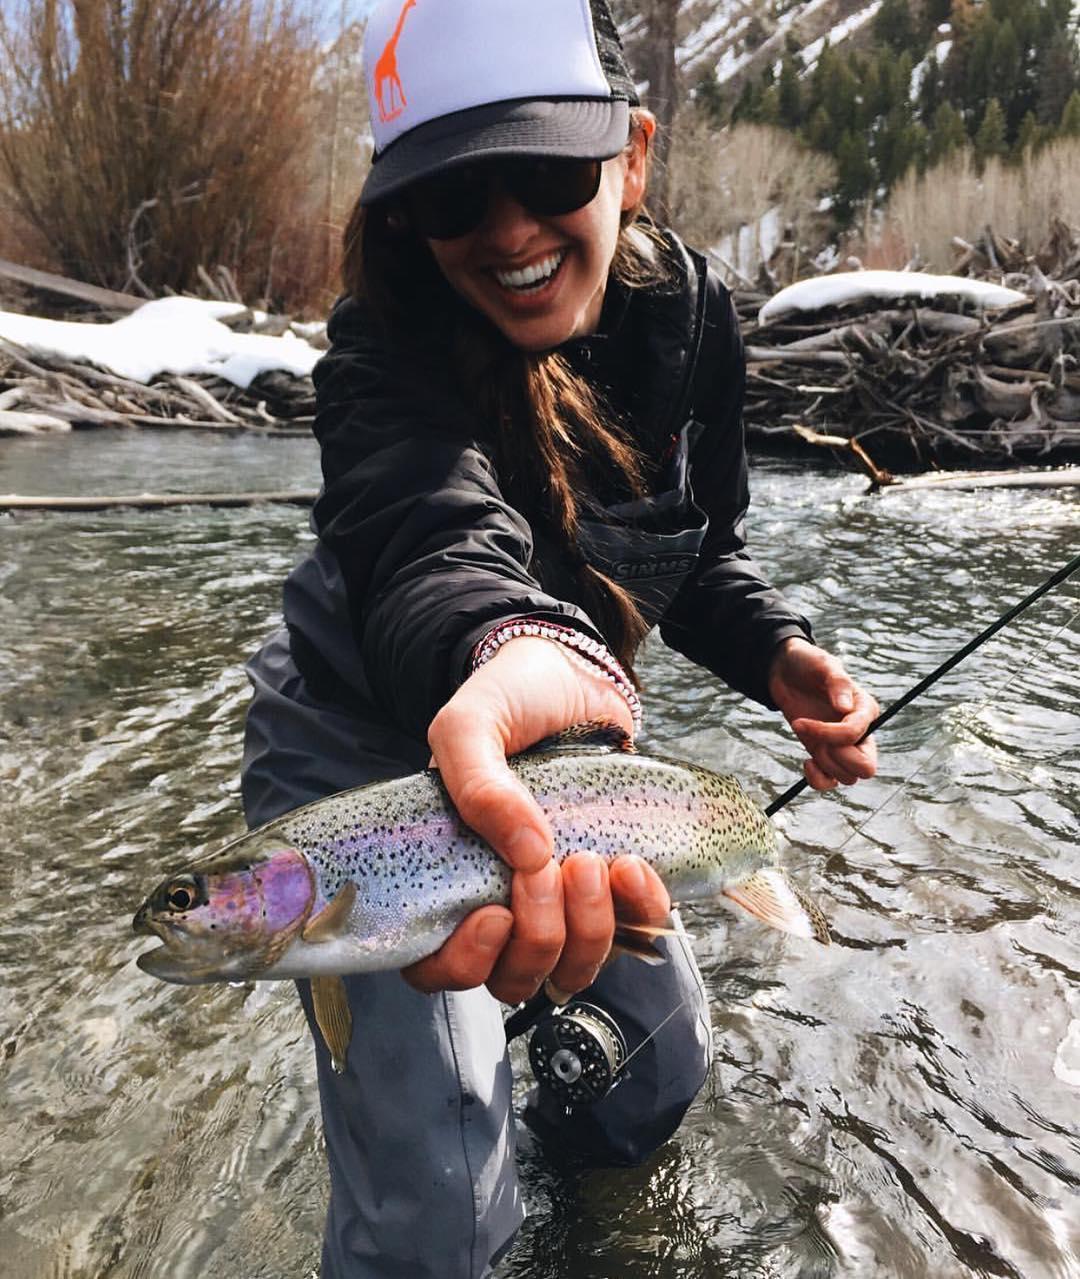 #Regram from @evarendle slaying a beautiful rainbow trout somewhere in Idaho. Anglers like to keep their fishin' holes hush hush. Thanks for reppin' the #girafficorn. #iamsj #SheJumps #girafficornnation #flyfishing #girlswhoflyfish #rivertherapy...